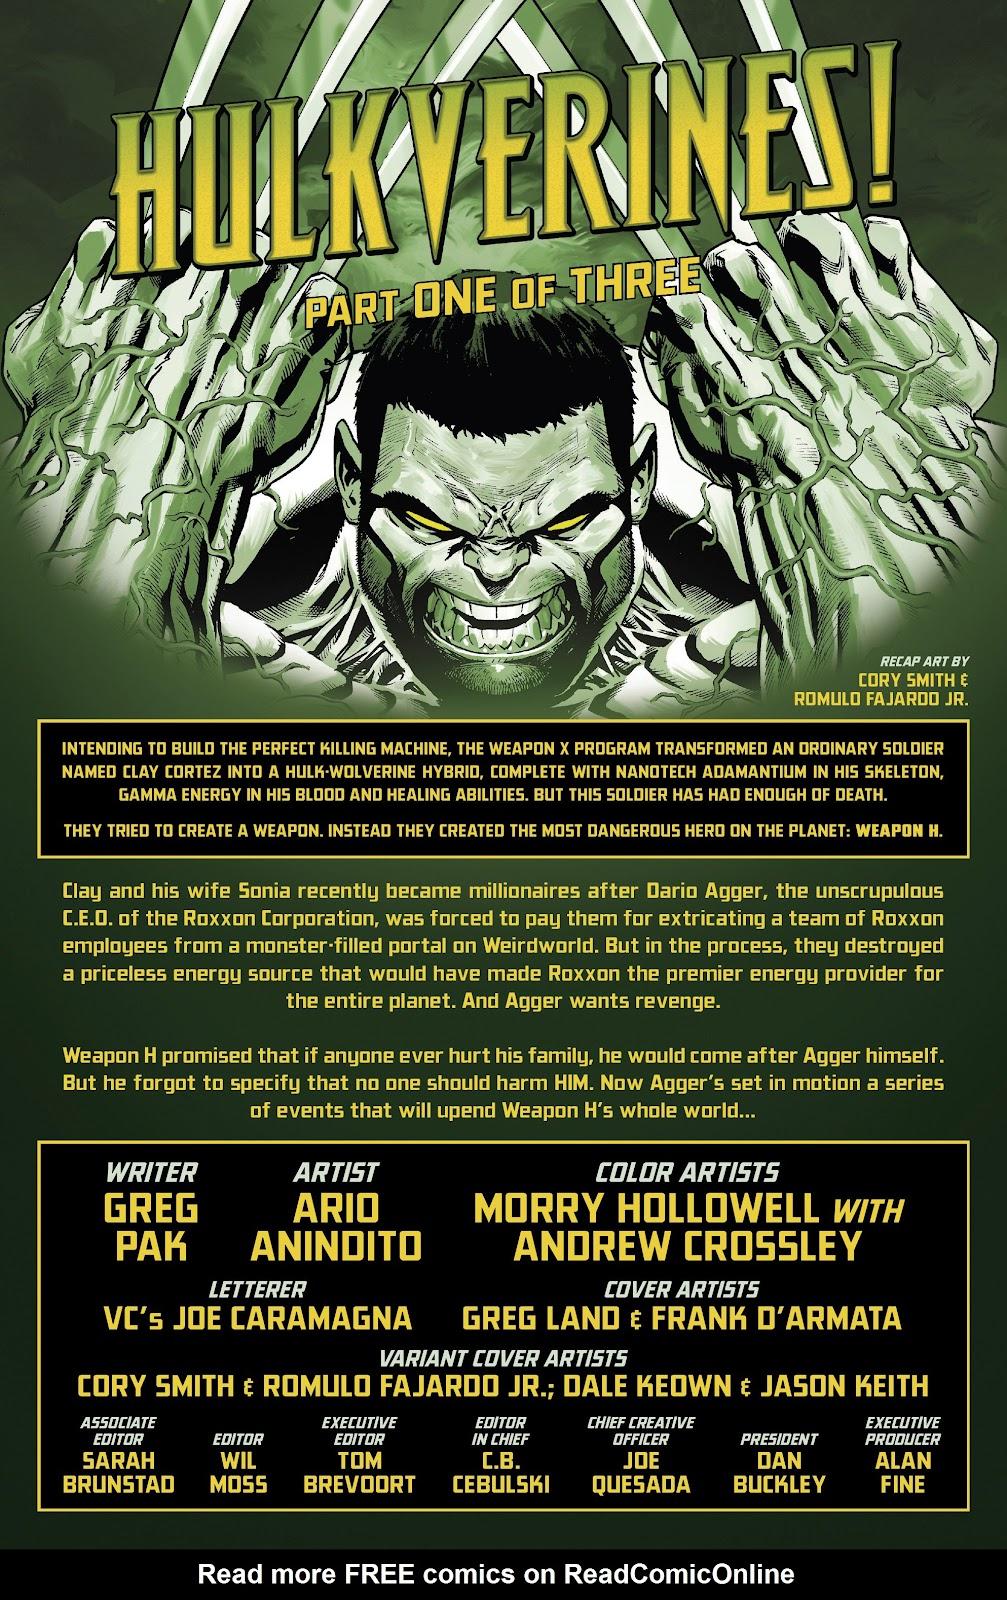 Read online Hulkverines comic -  Issue #1 - 2